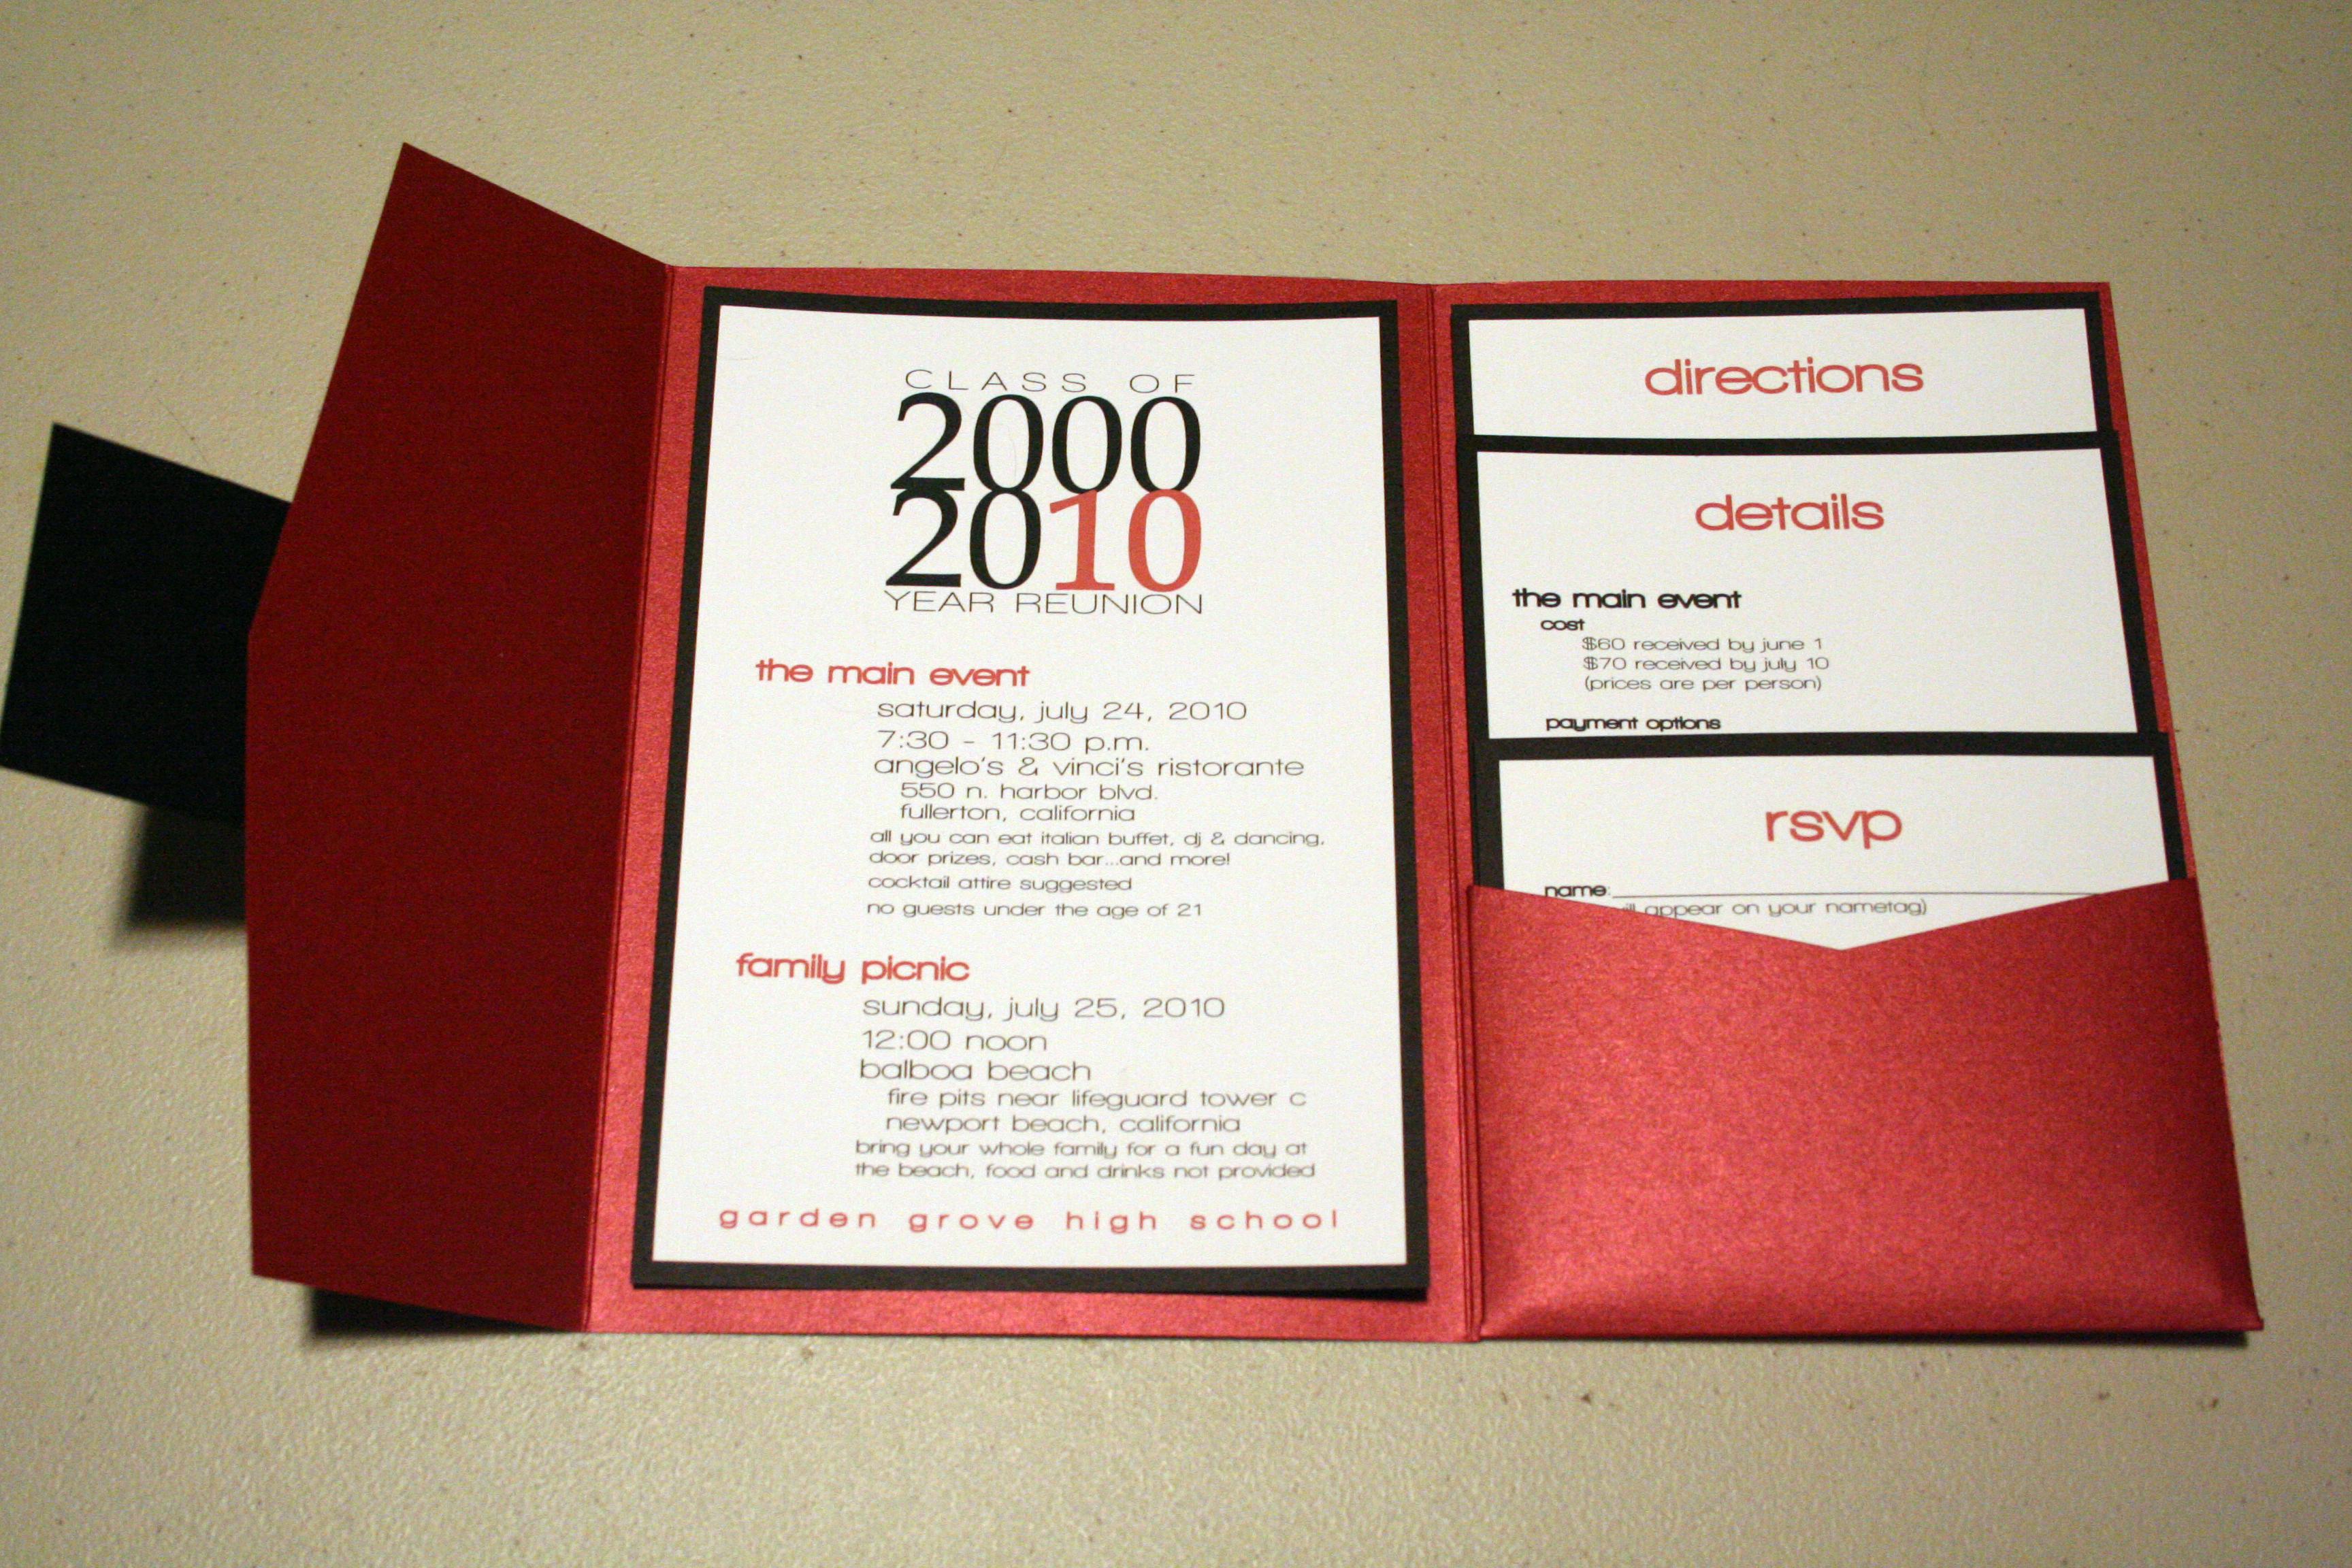 Garden grove high school 10 year reunion mia cartoleria the inside of the invitations stopboris Gallery